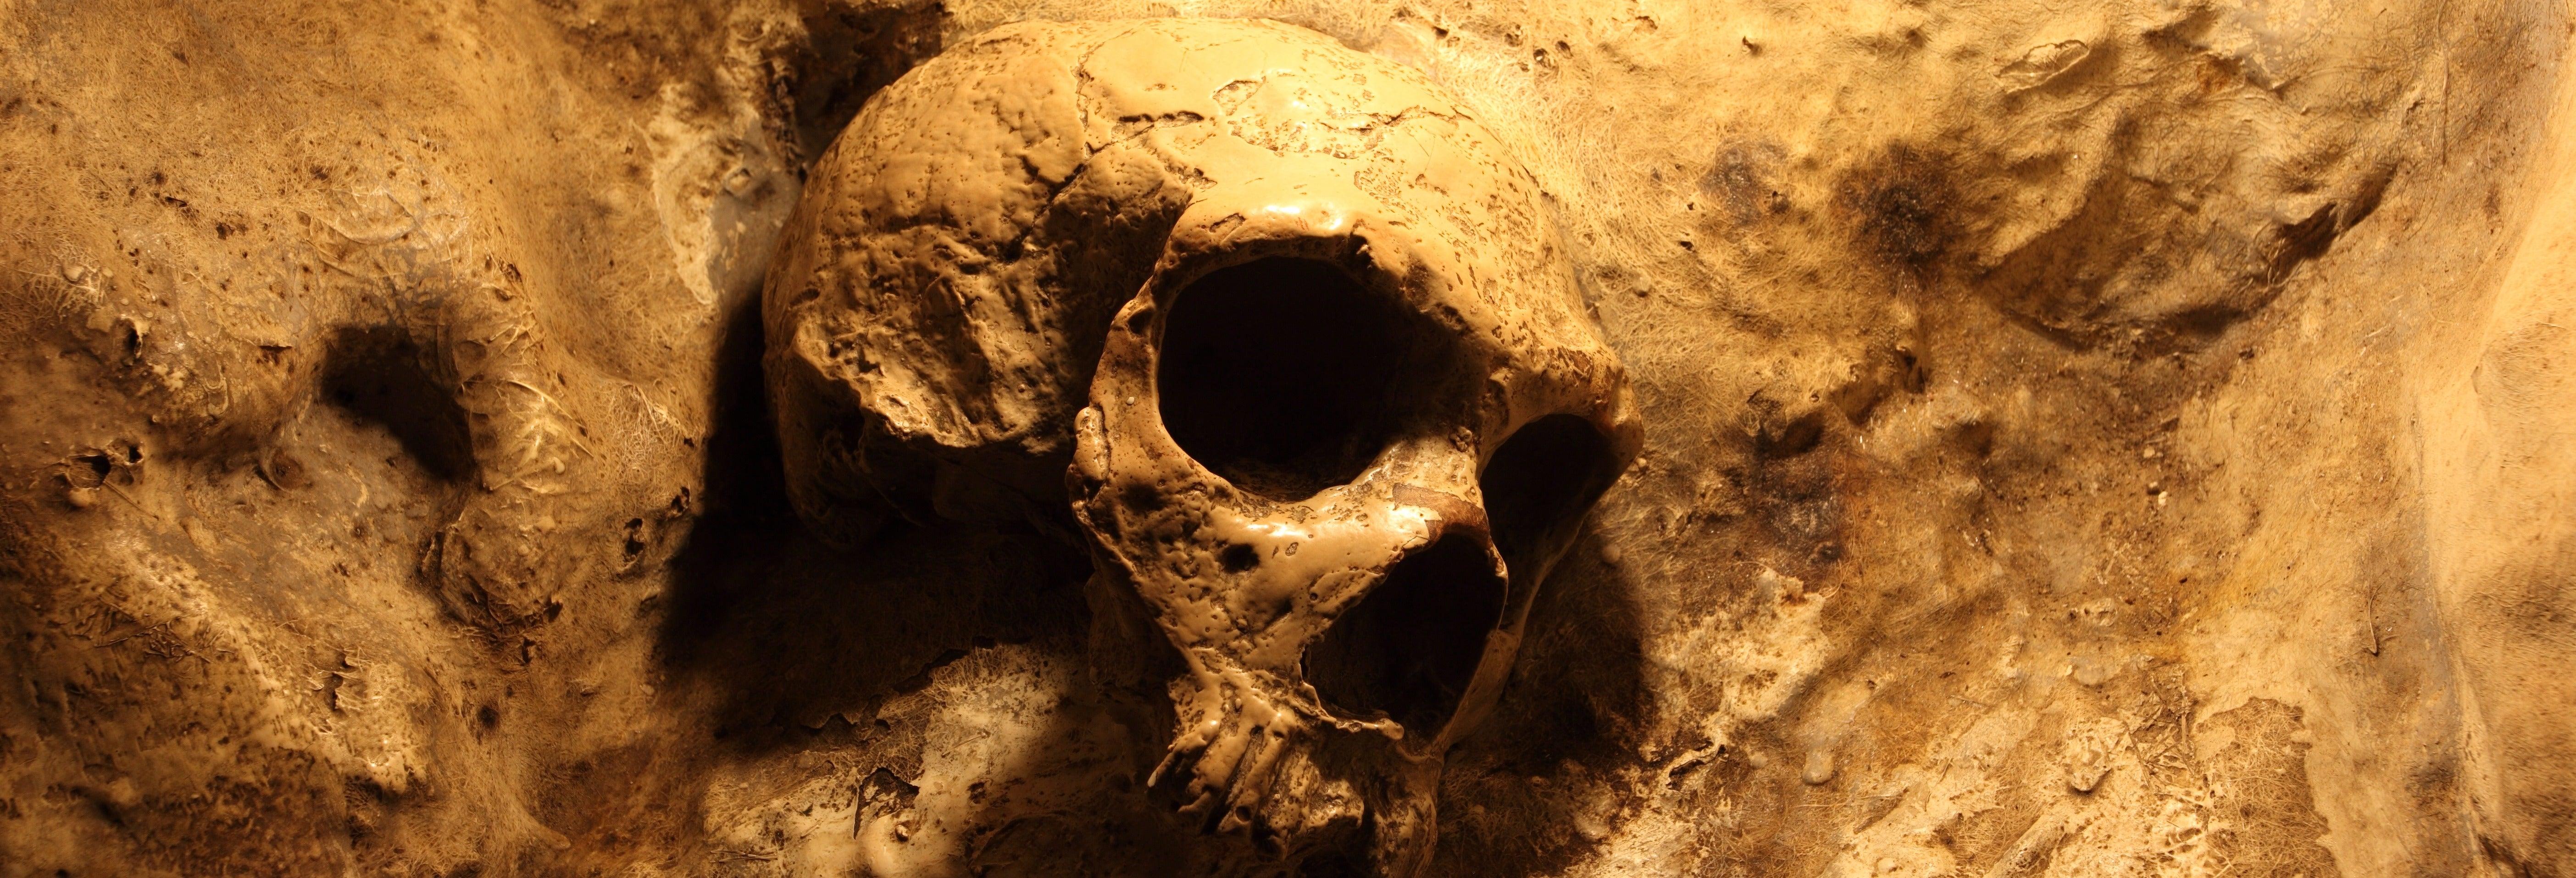 Excursión a la cueva Actun Tunichil Muknal